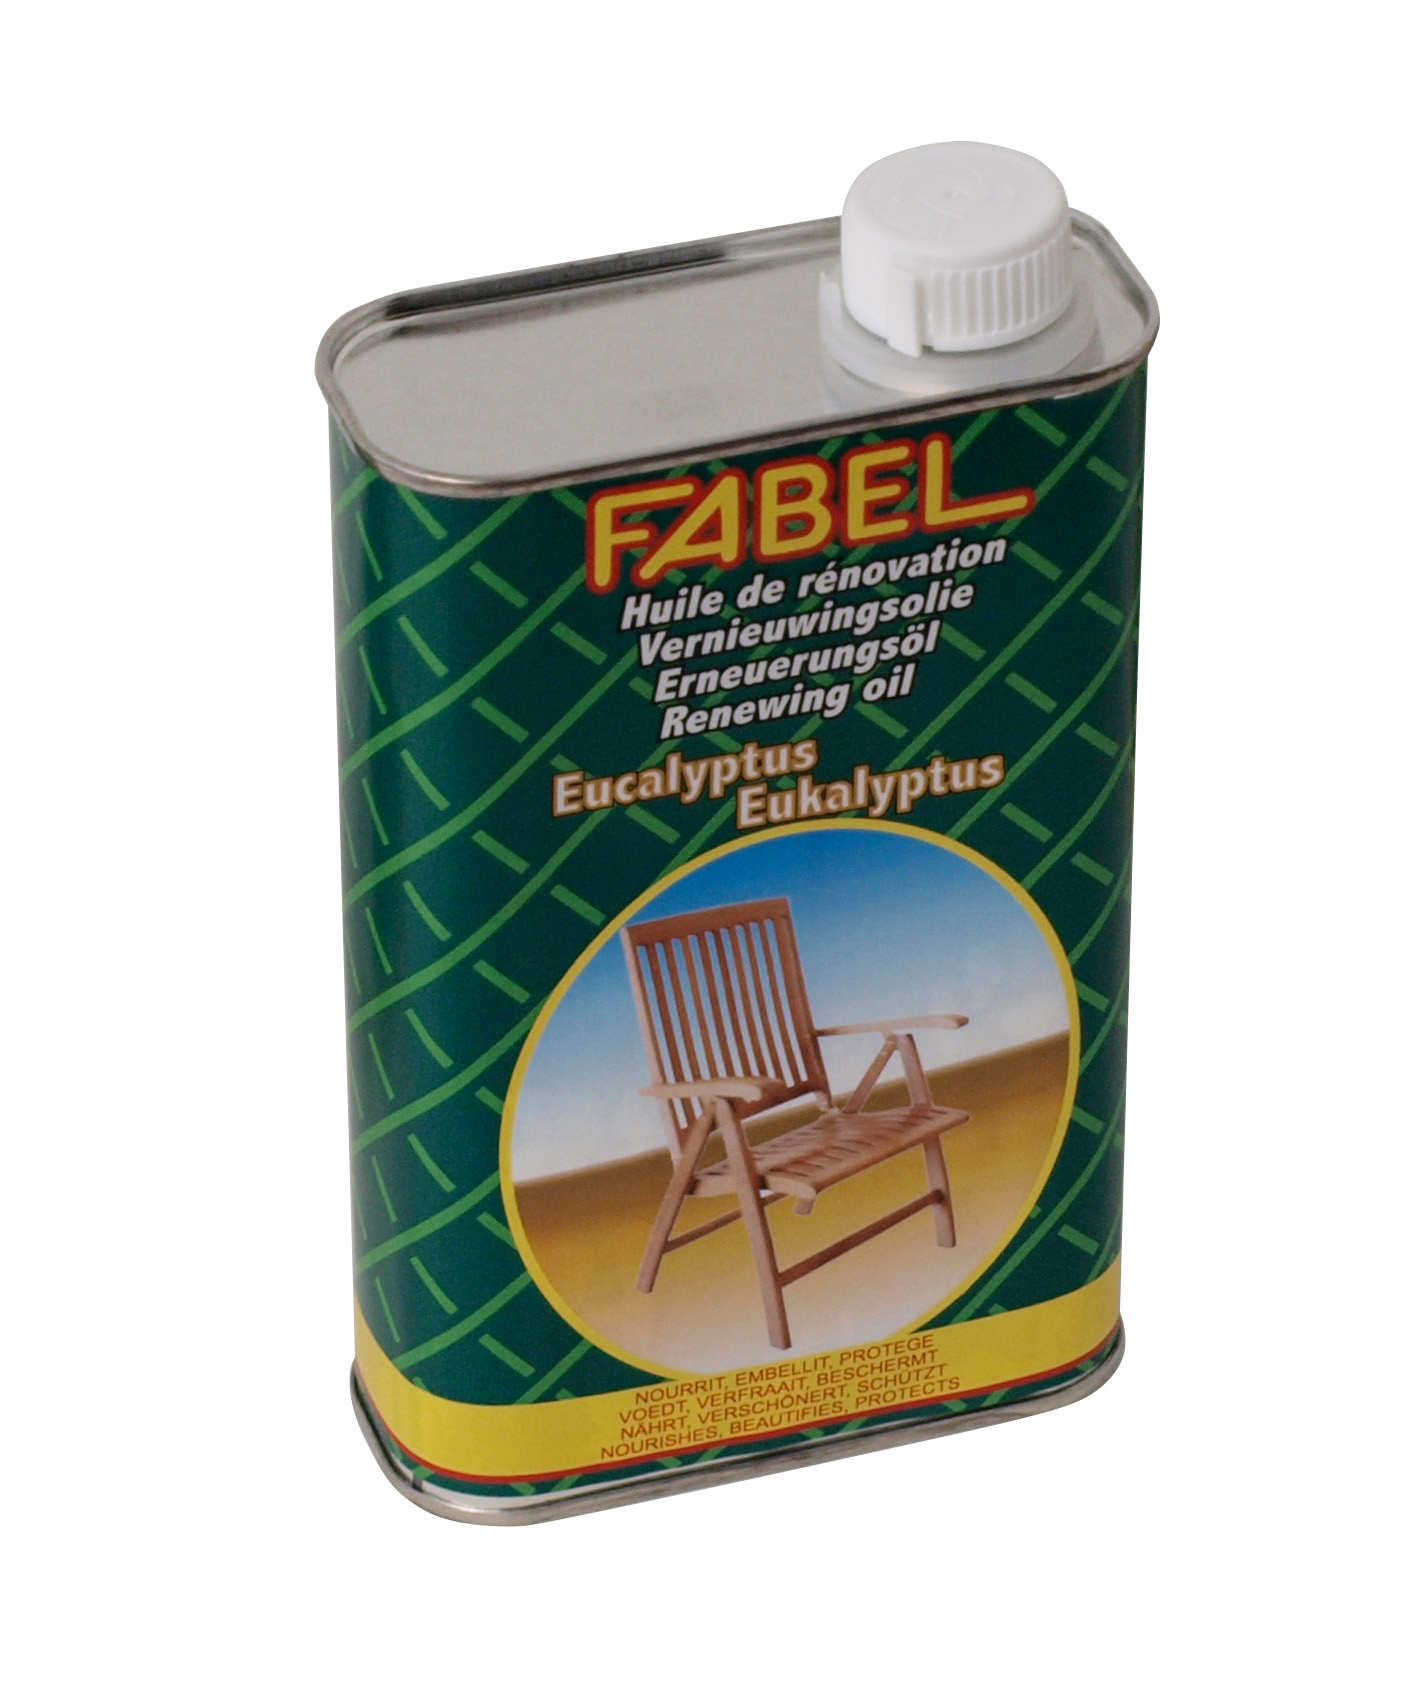 Spezial-Pflegeöl für Eukalyptusholzmöbel, 500ml (€35,96 pro l)